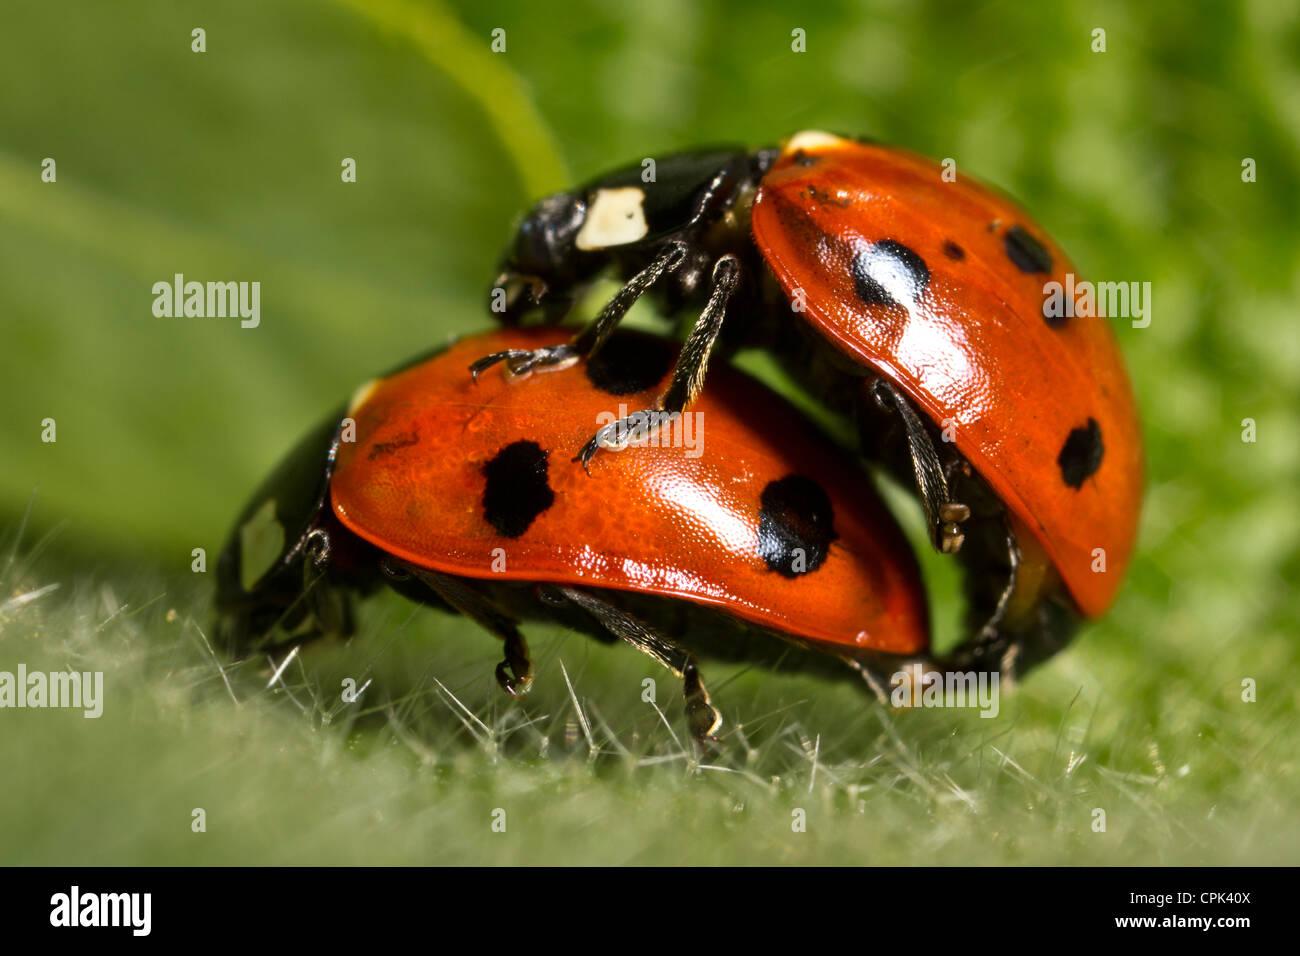 Ladybirds mating - Stock Image